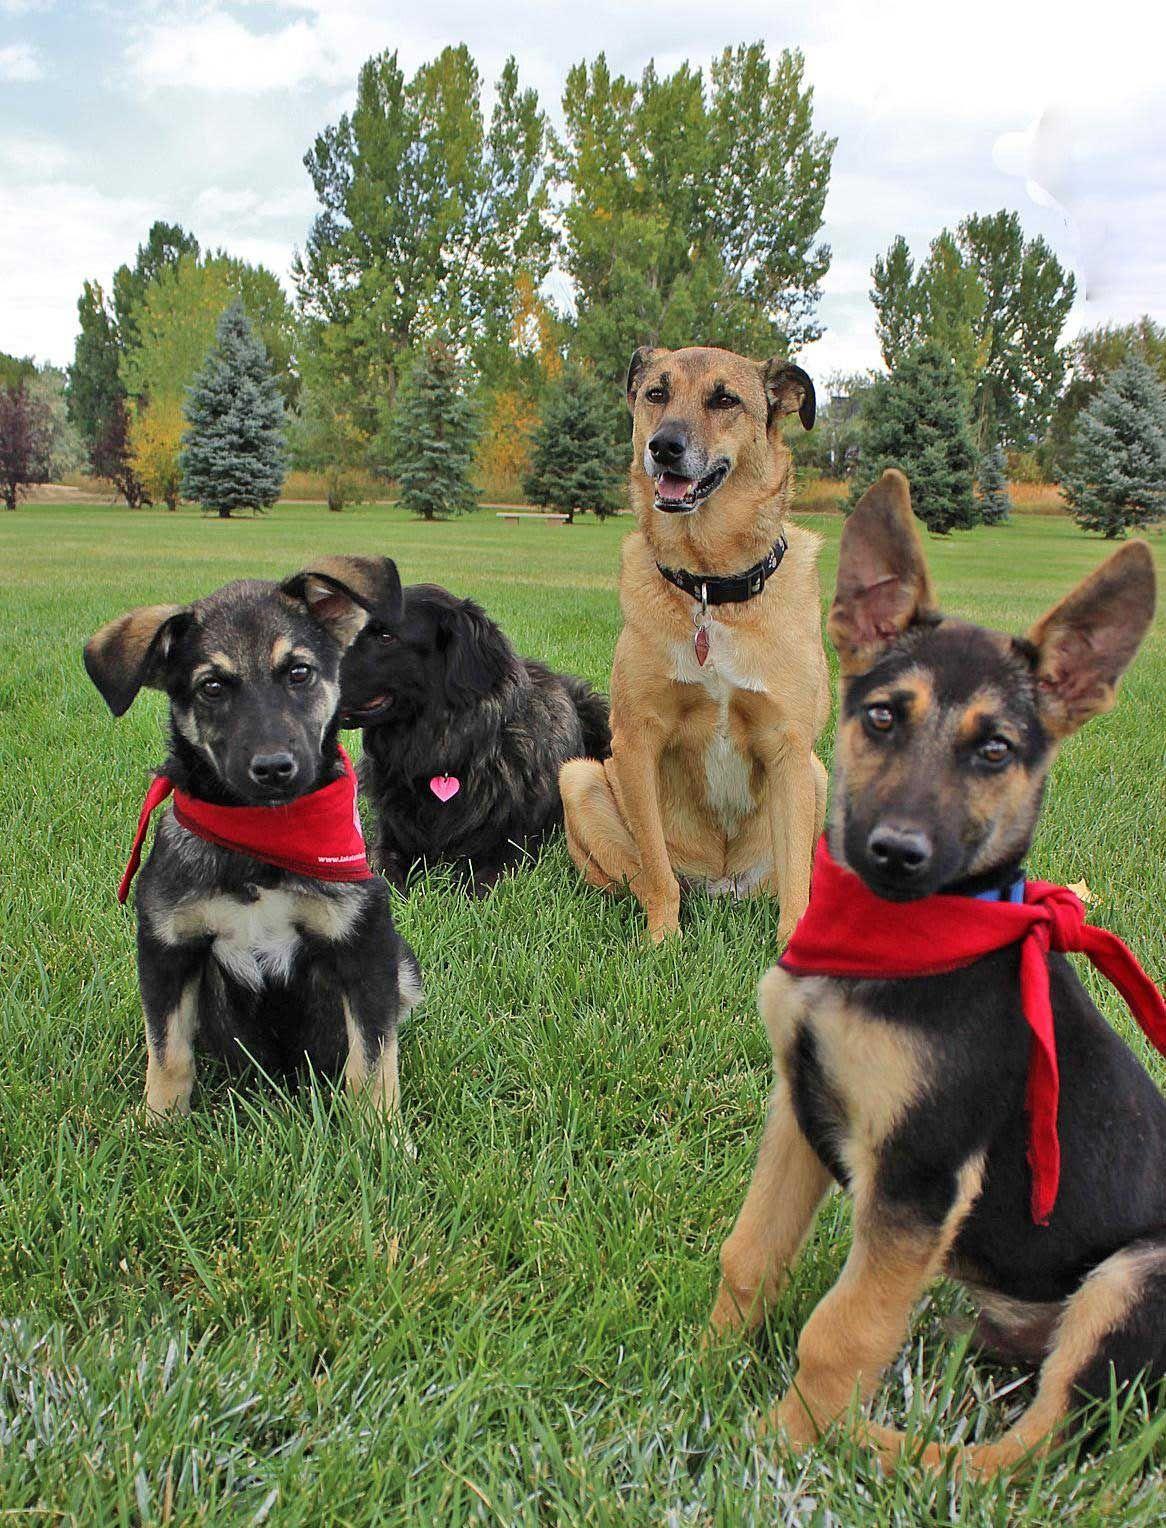 Lakota Animal Care Project Helps Dogs on Pine Ridge